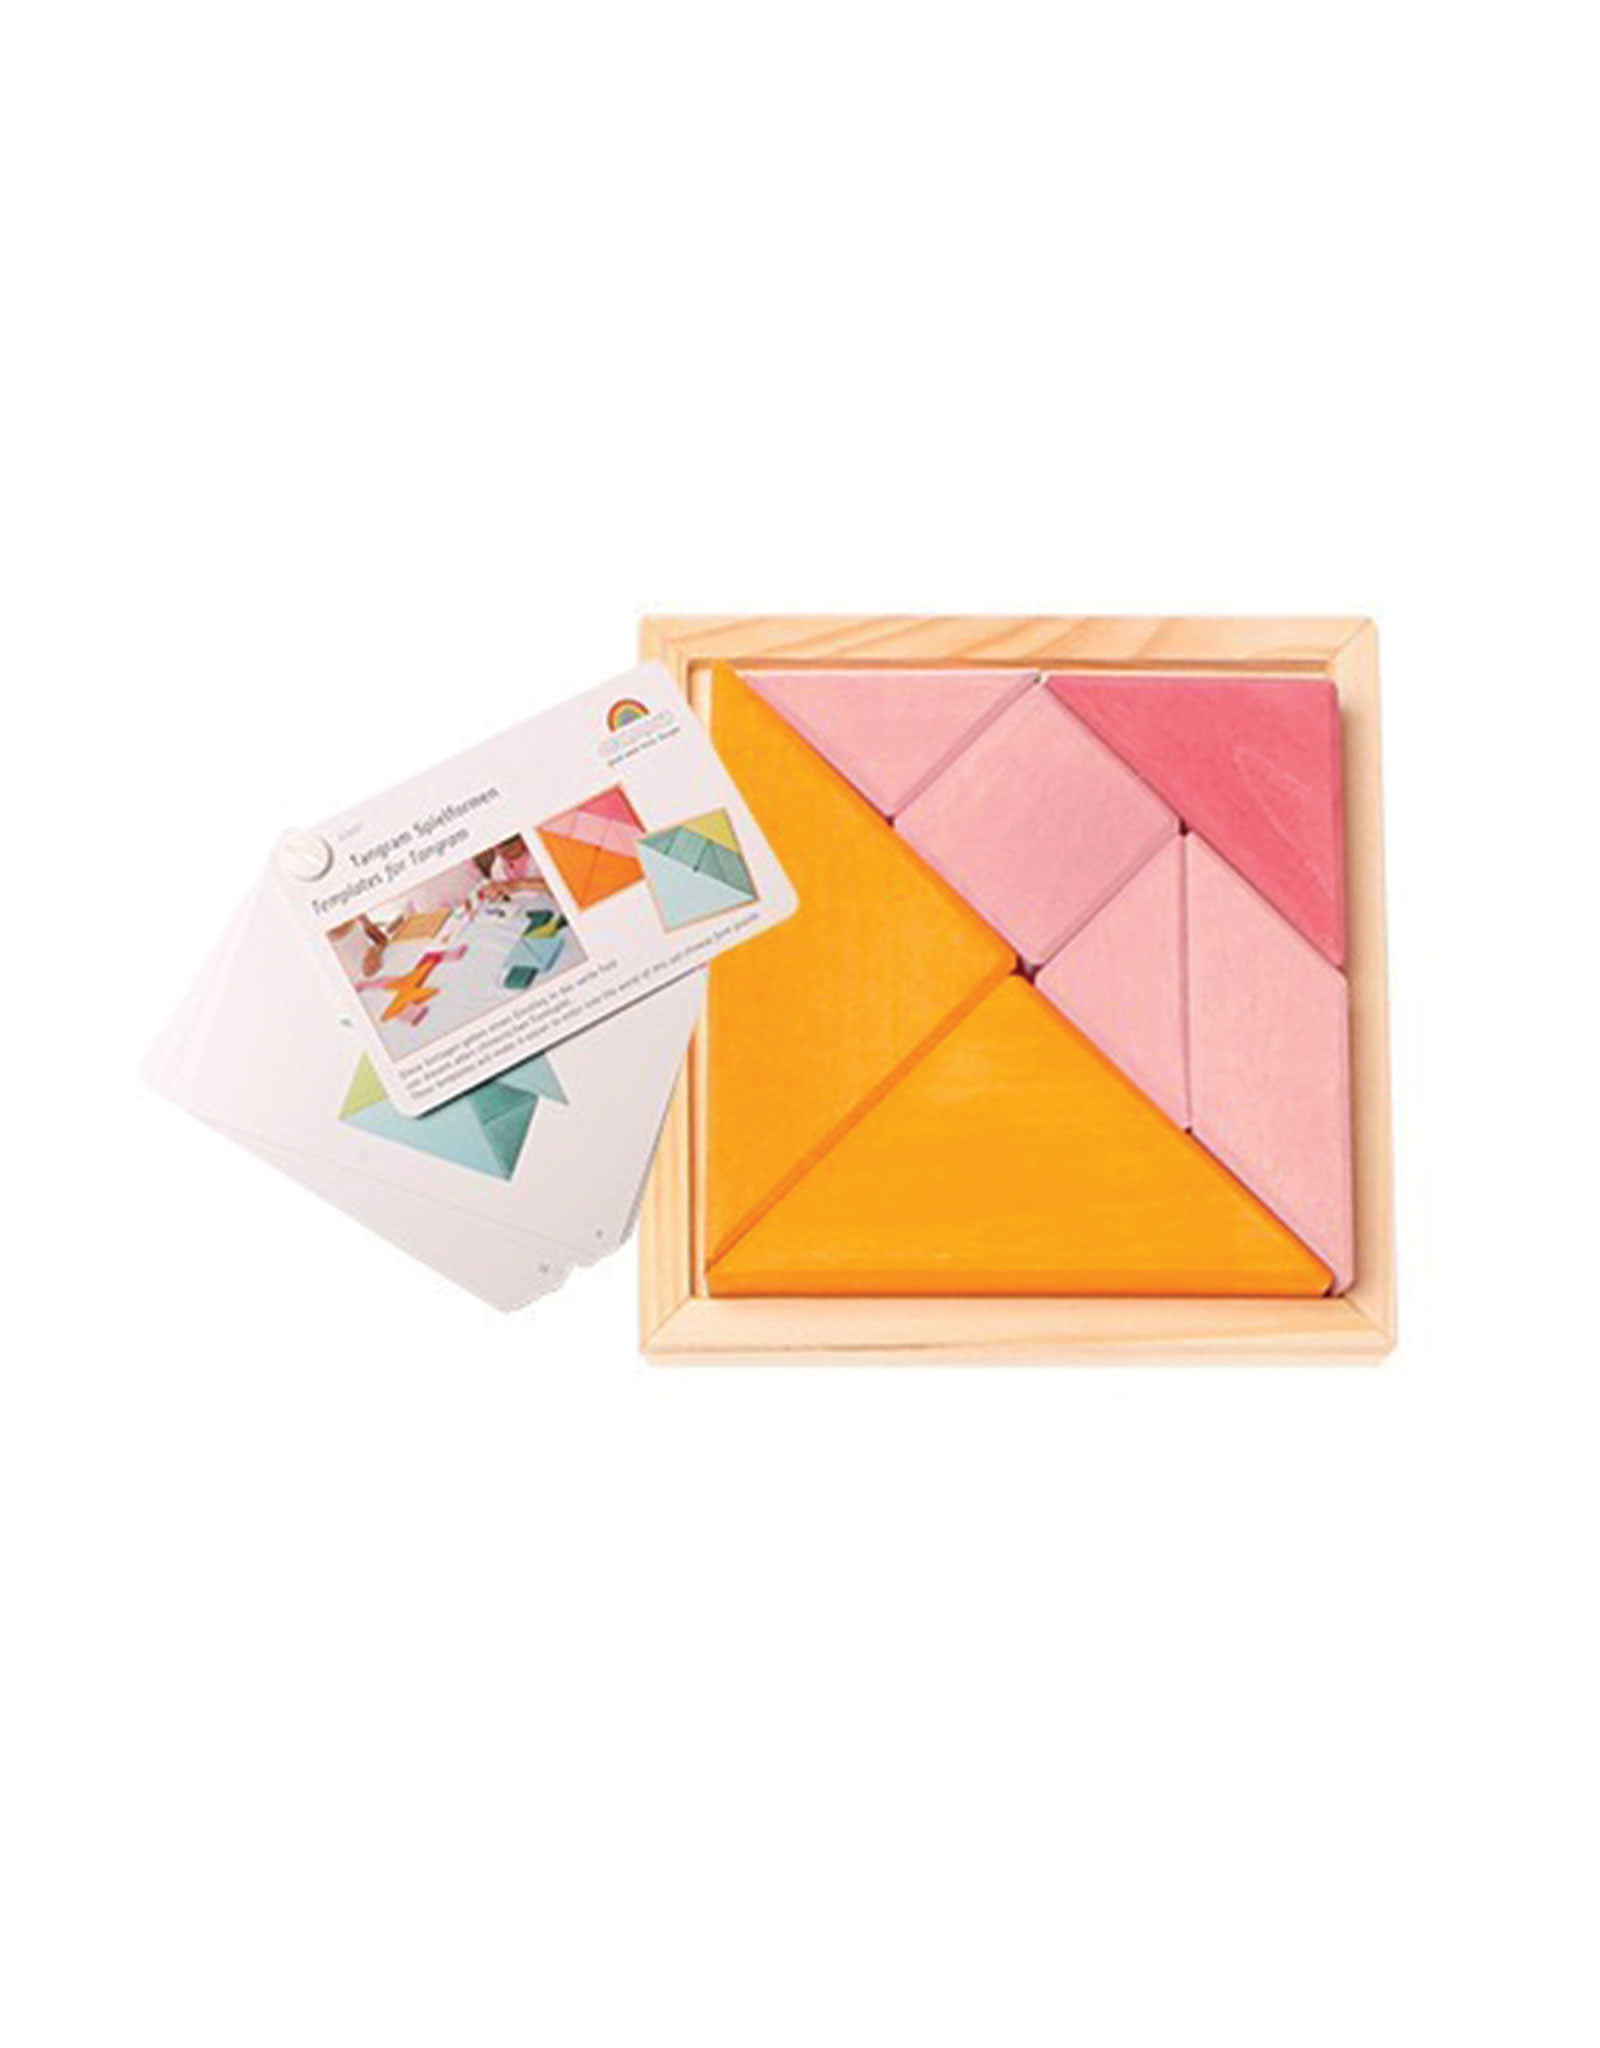 Grimm's Tangram Puzzle Orange And Pink